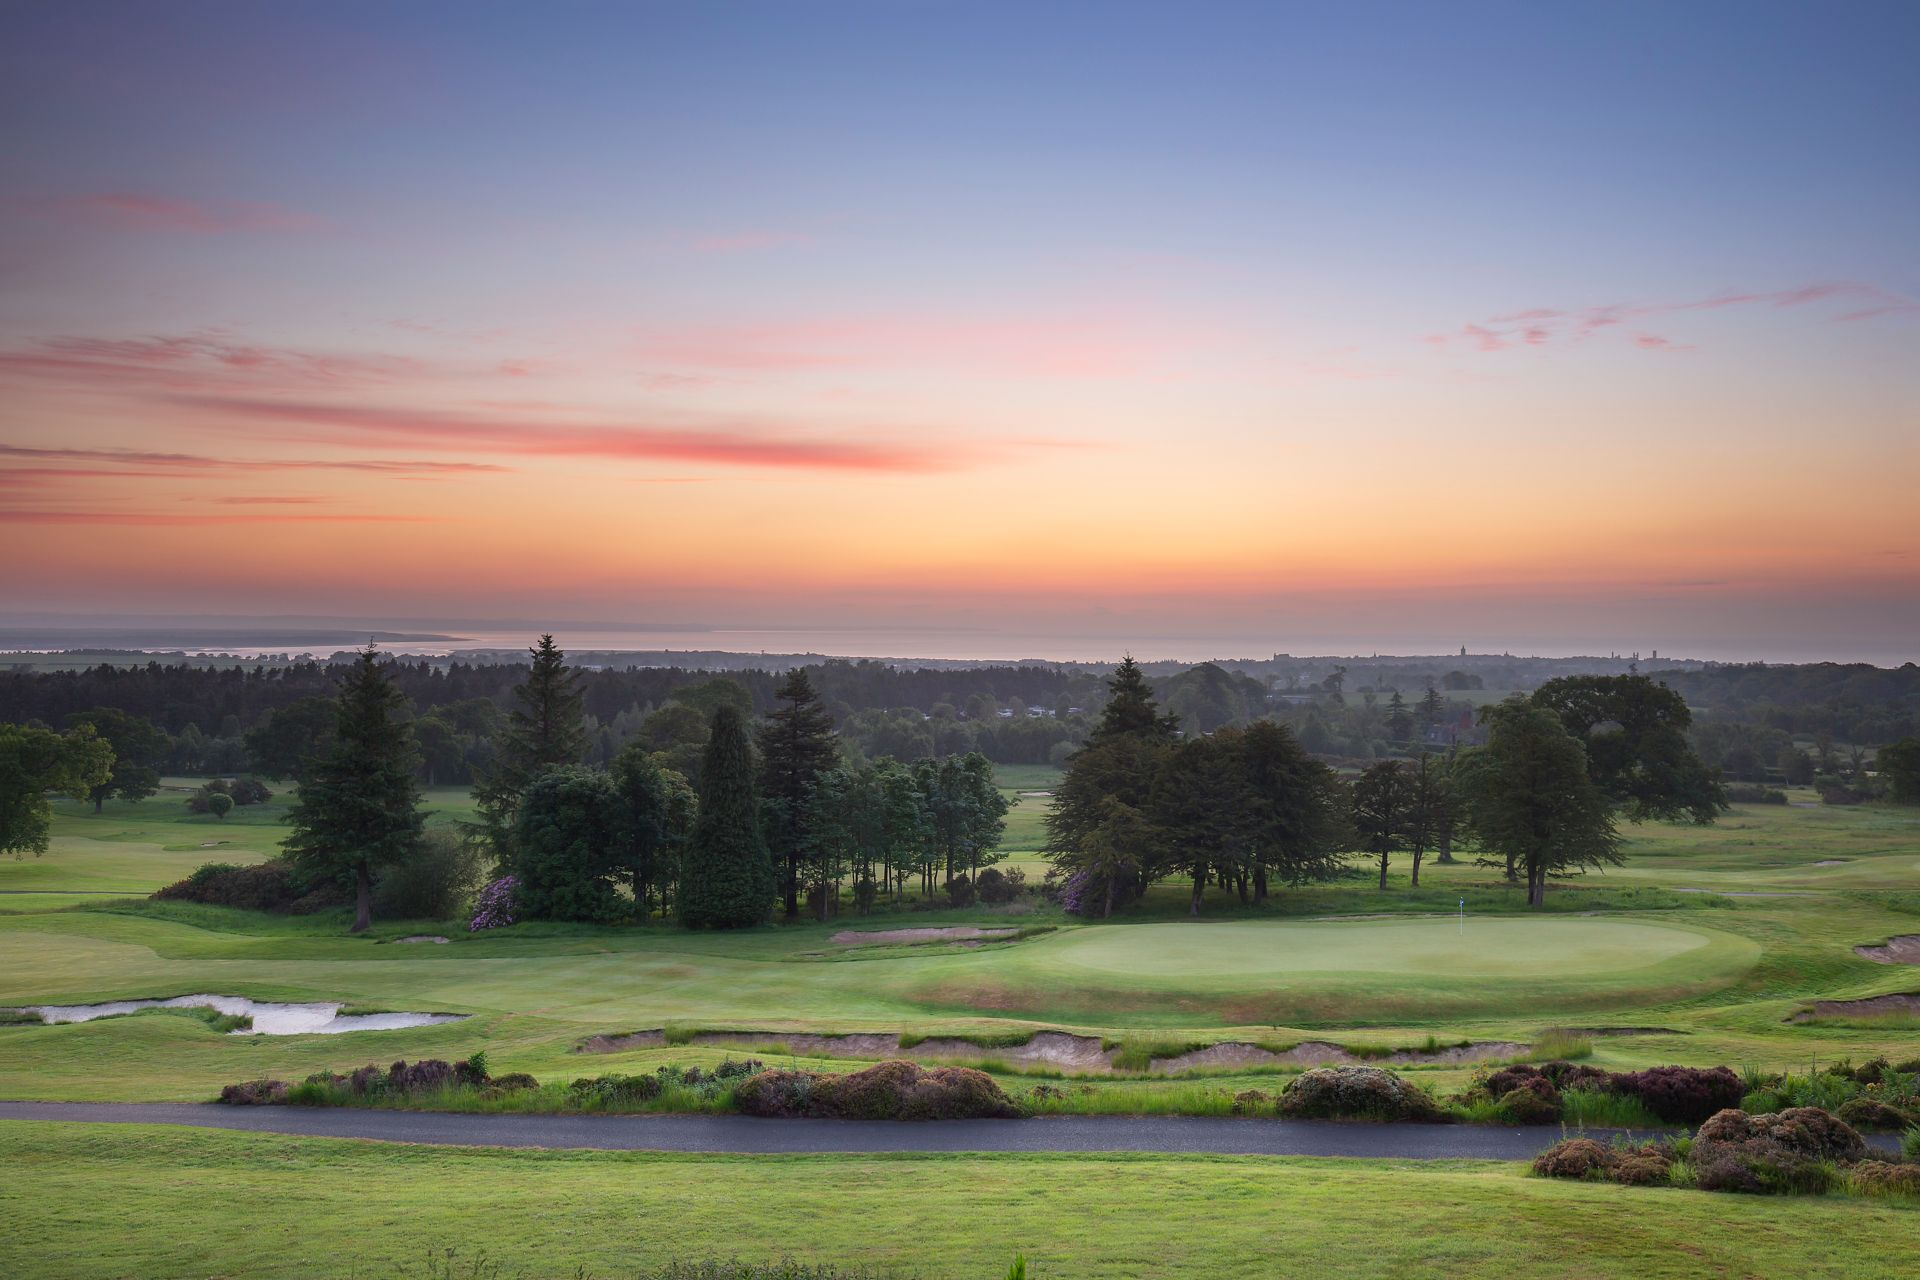 Sunrise at The Duke's Course, St Andrews